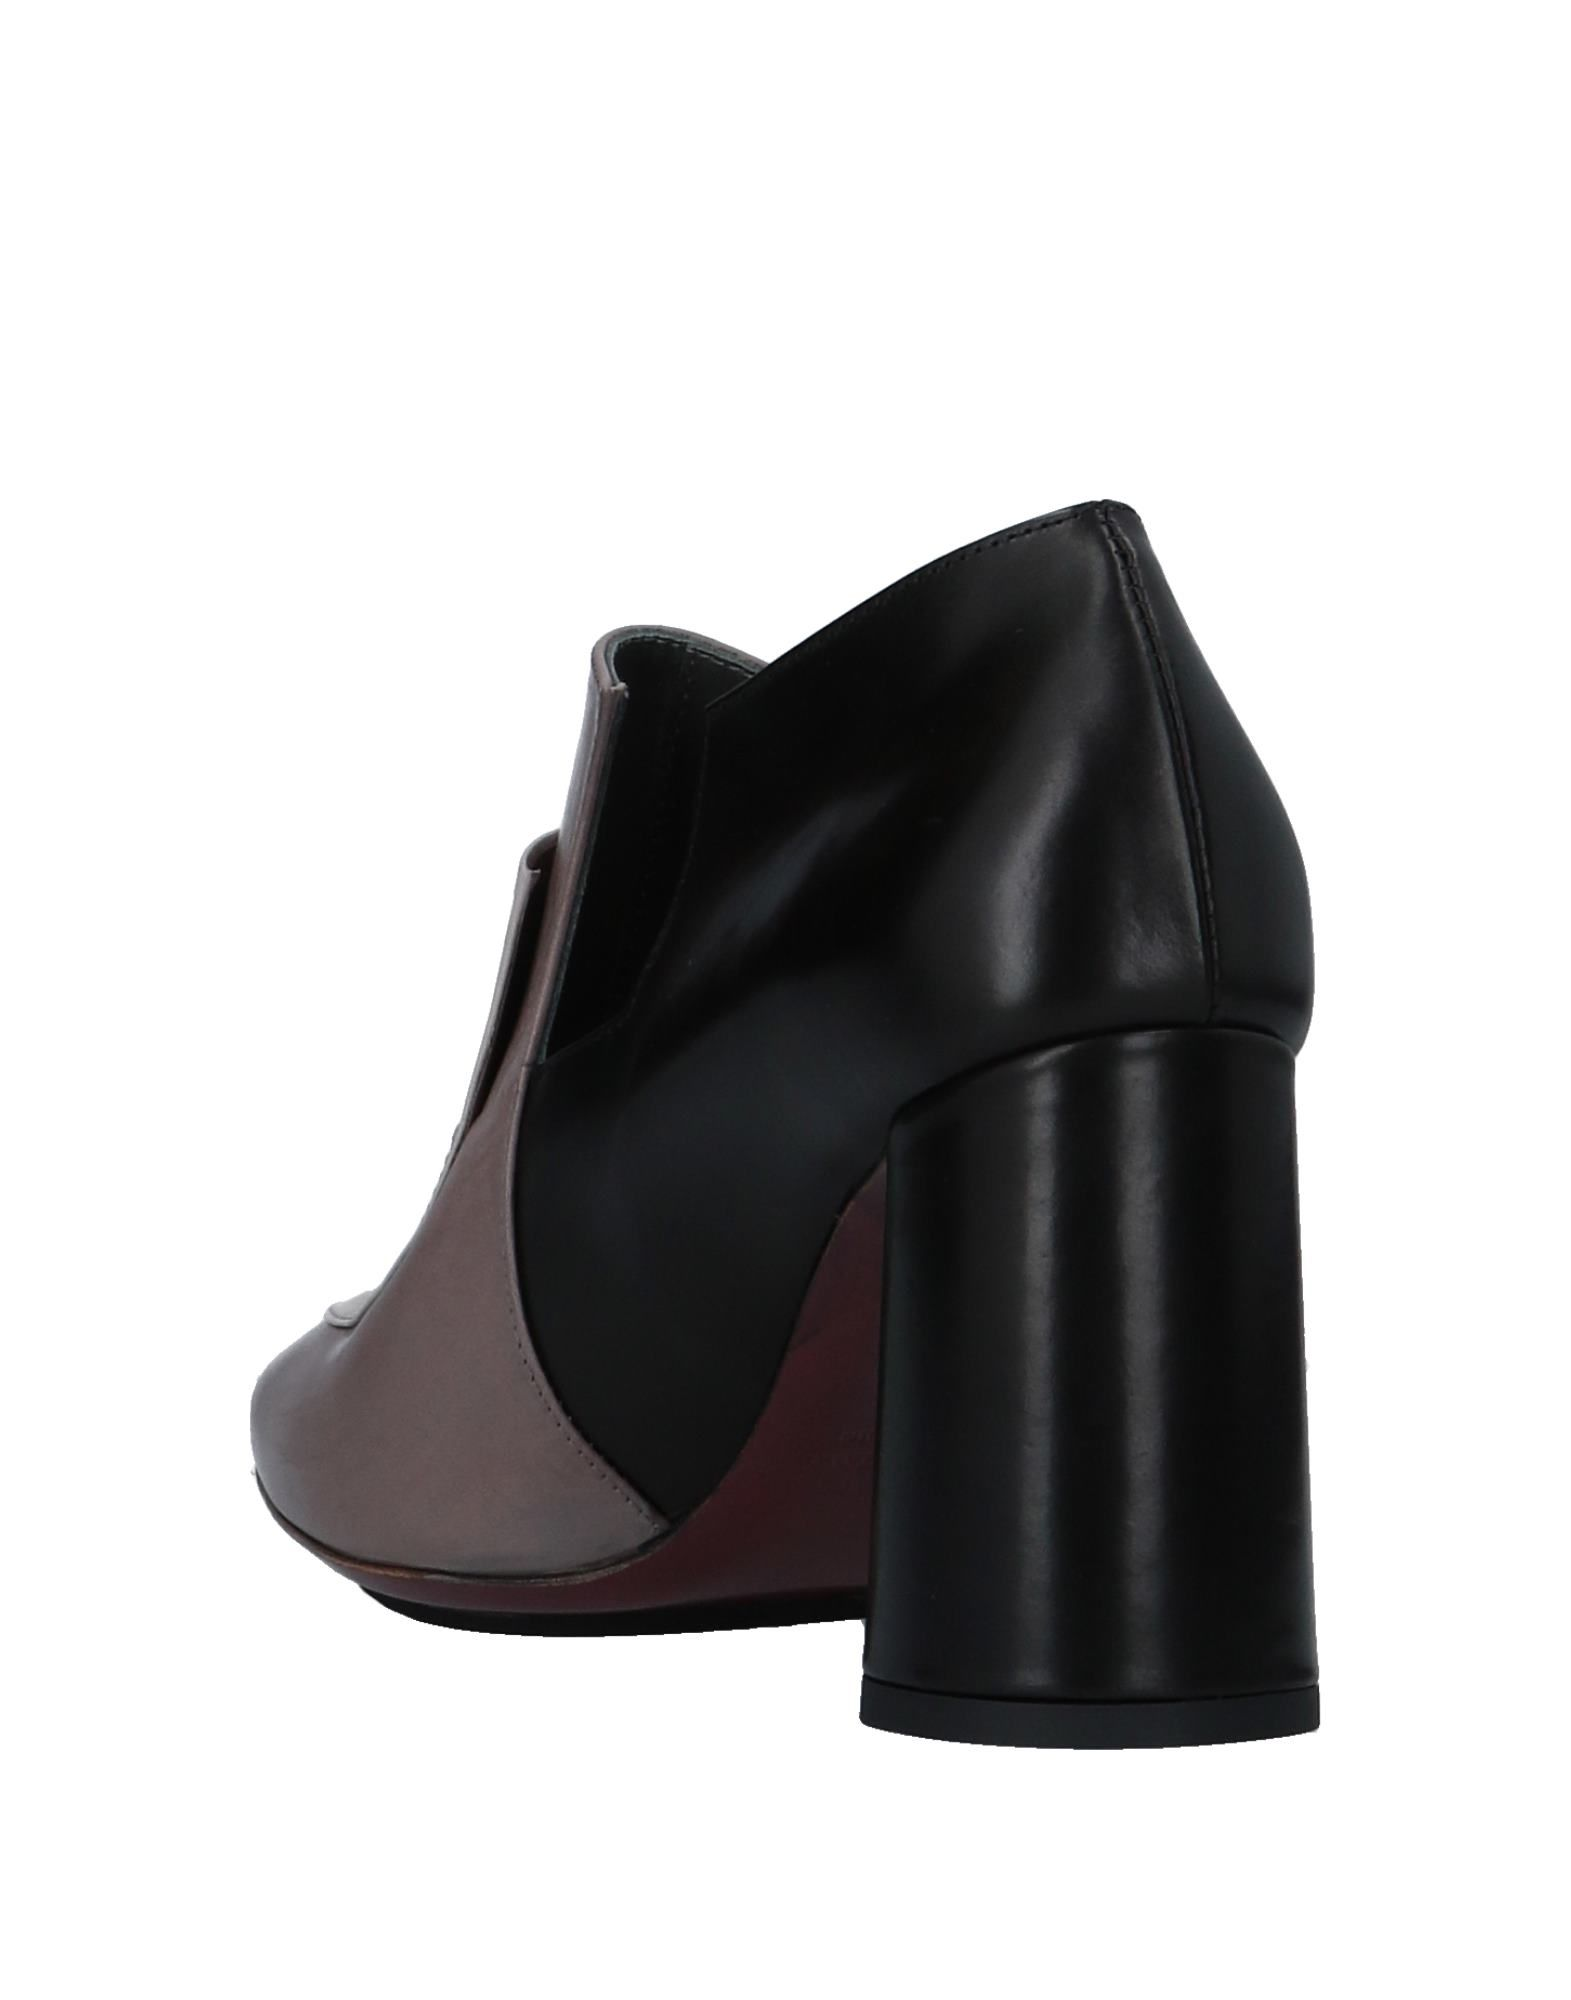 Rabatt Schuhe Ixos Stiefelette Damen Damen Stiefelette  11544769IJ b9ab6f